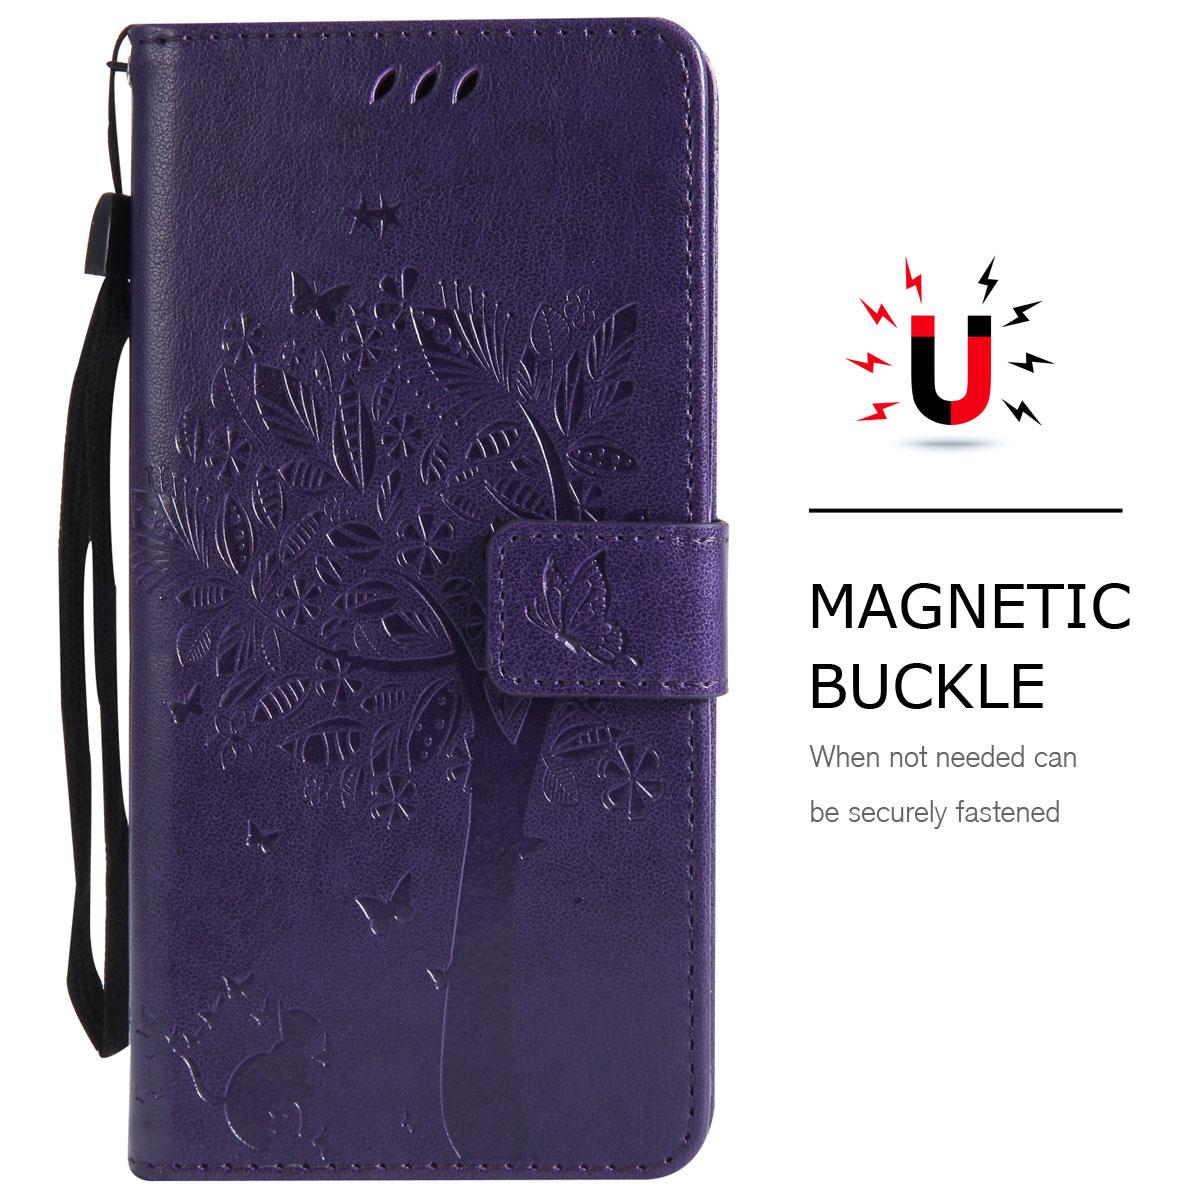 Magnetic-Leather-Credit-Card-Holder-Flip-Case-Cover-For-Google-Pixel-2-2-XL thumbnail 72